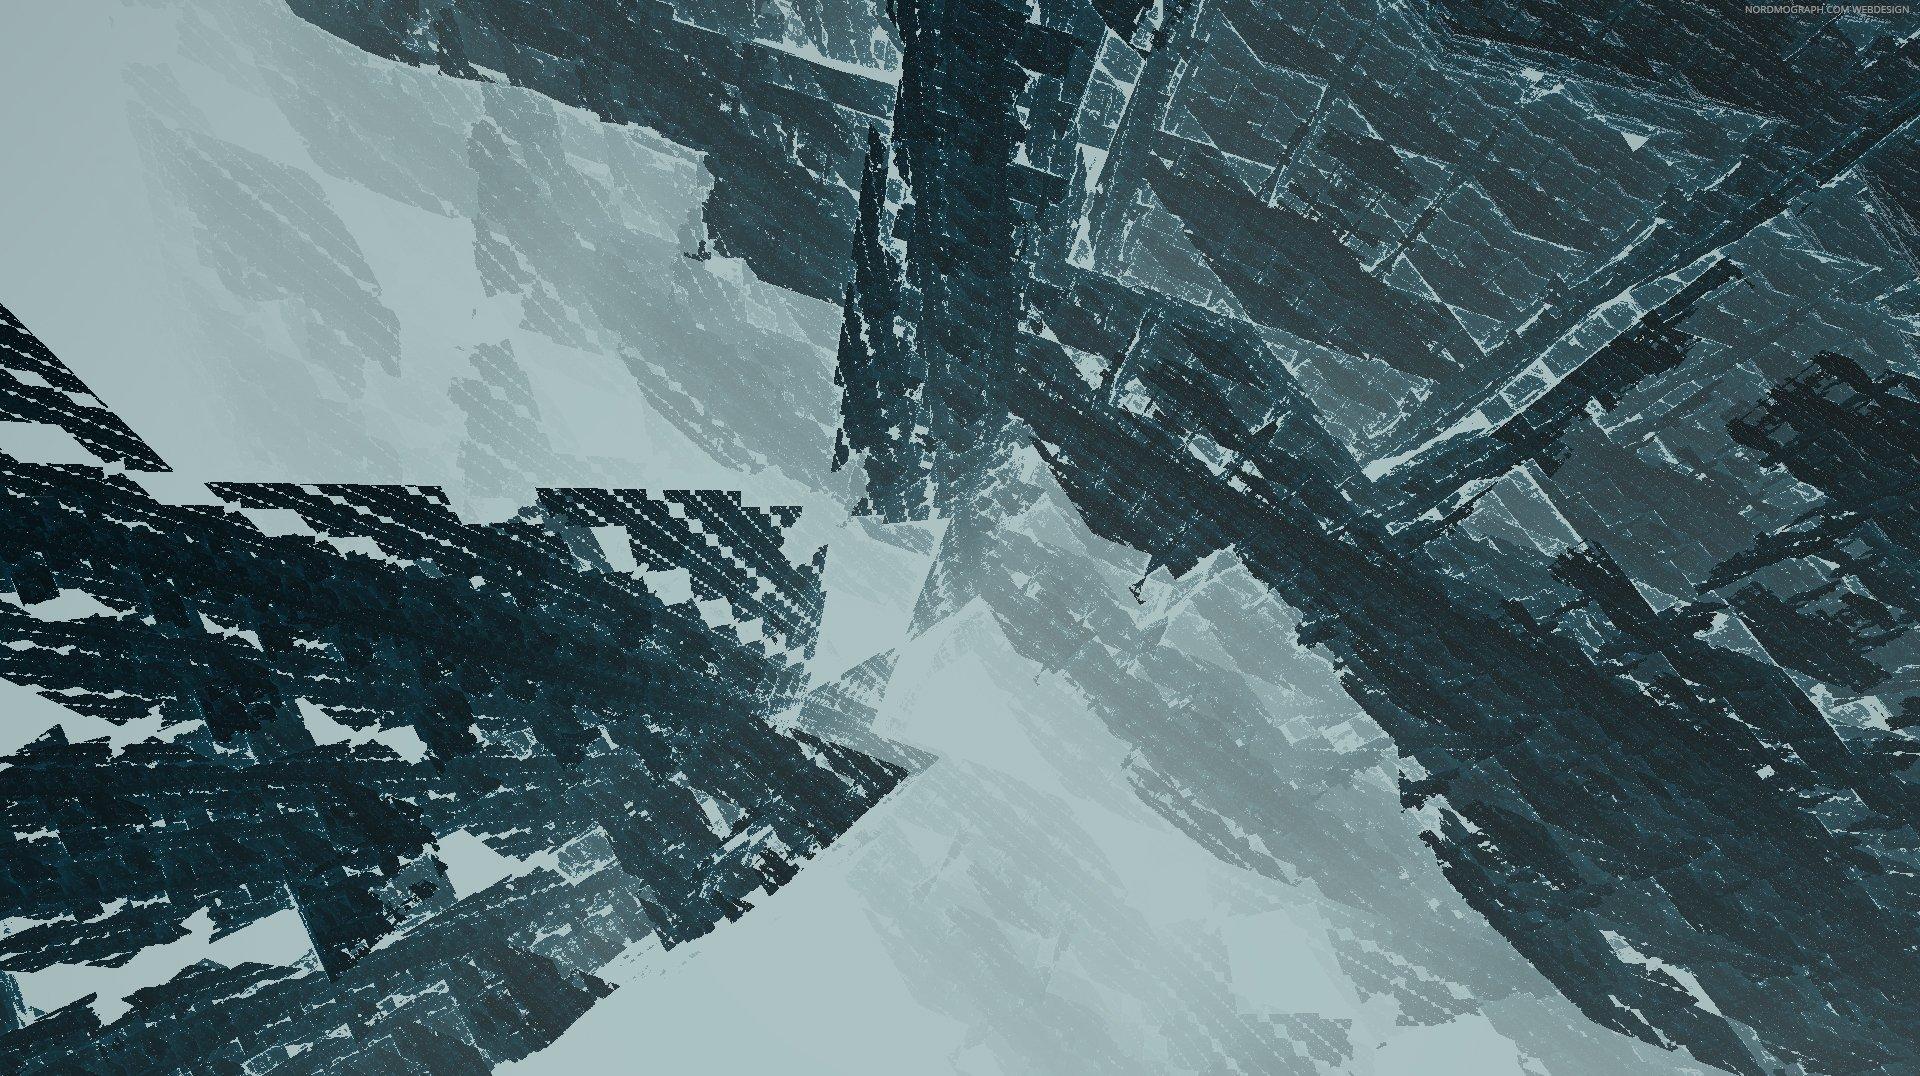 nordmograph webdesign nordmograph webdesign abstract